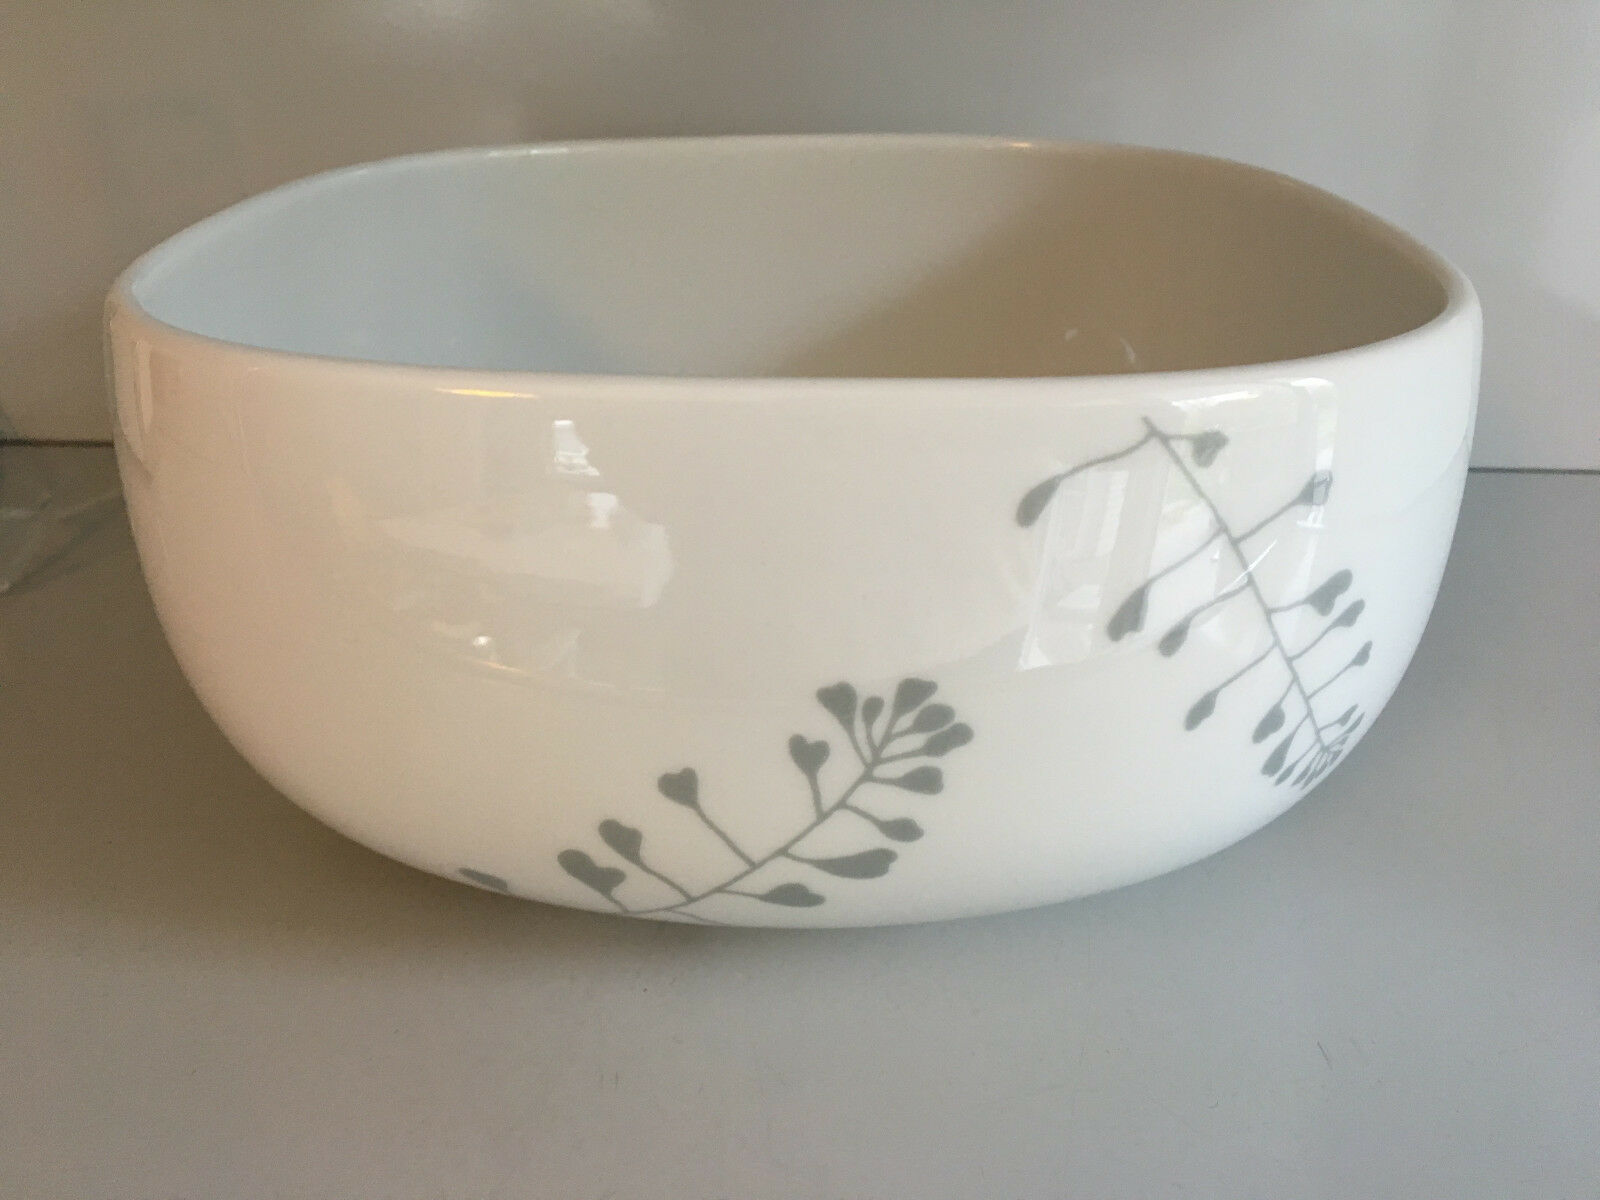 Rosenthal Suomi Celebration Bol 20 cm Salad Bowl